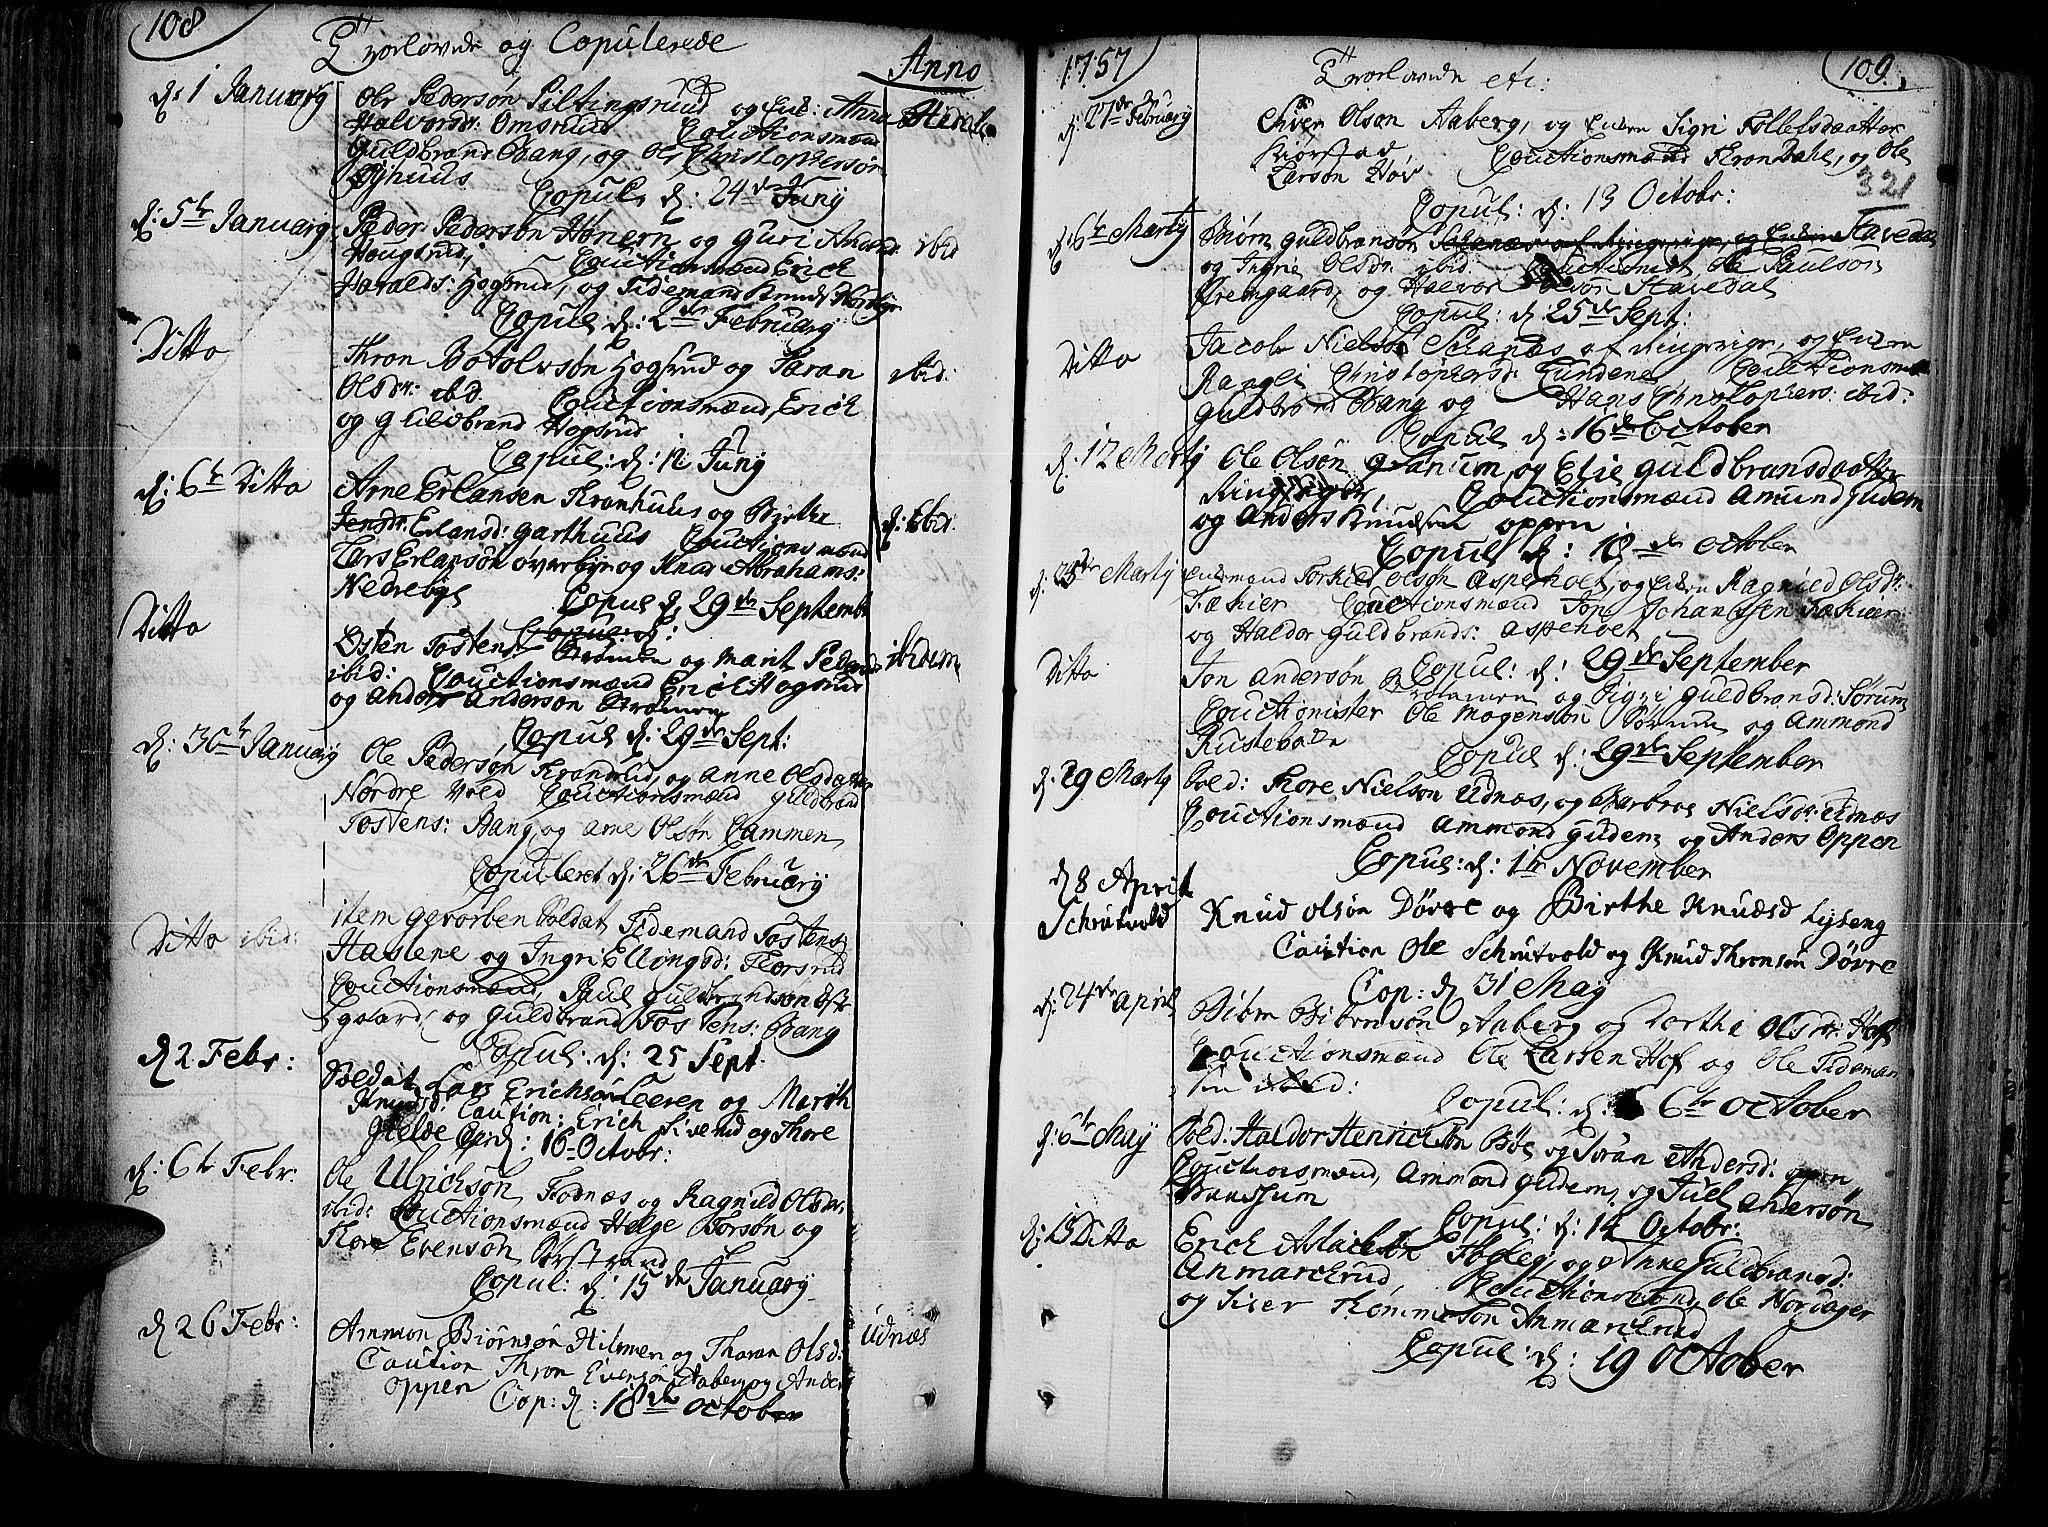 SAH, Aurdal prestekontor, Ministerialbok nr. 4, 1730-1762, s. 108-109